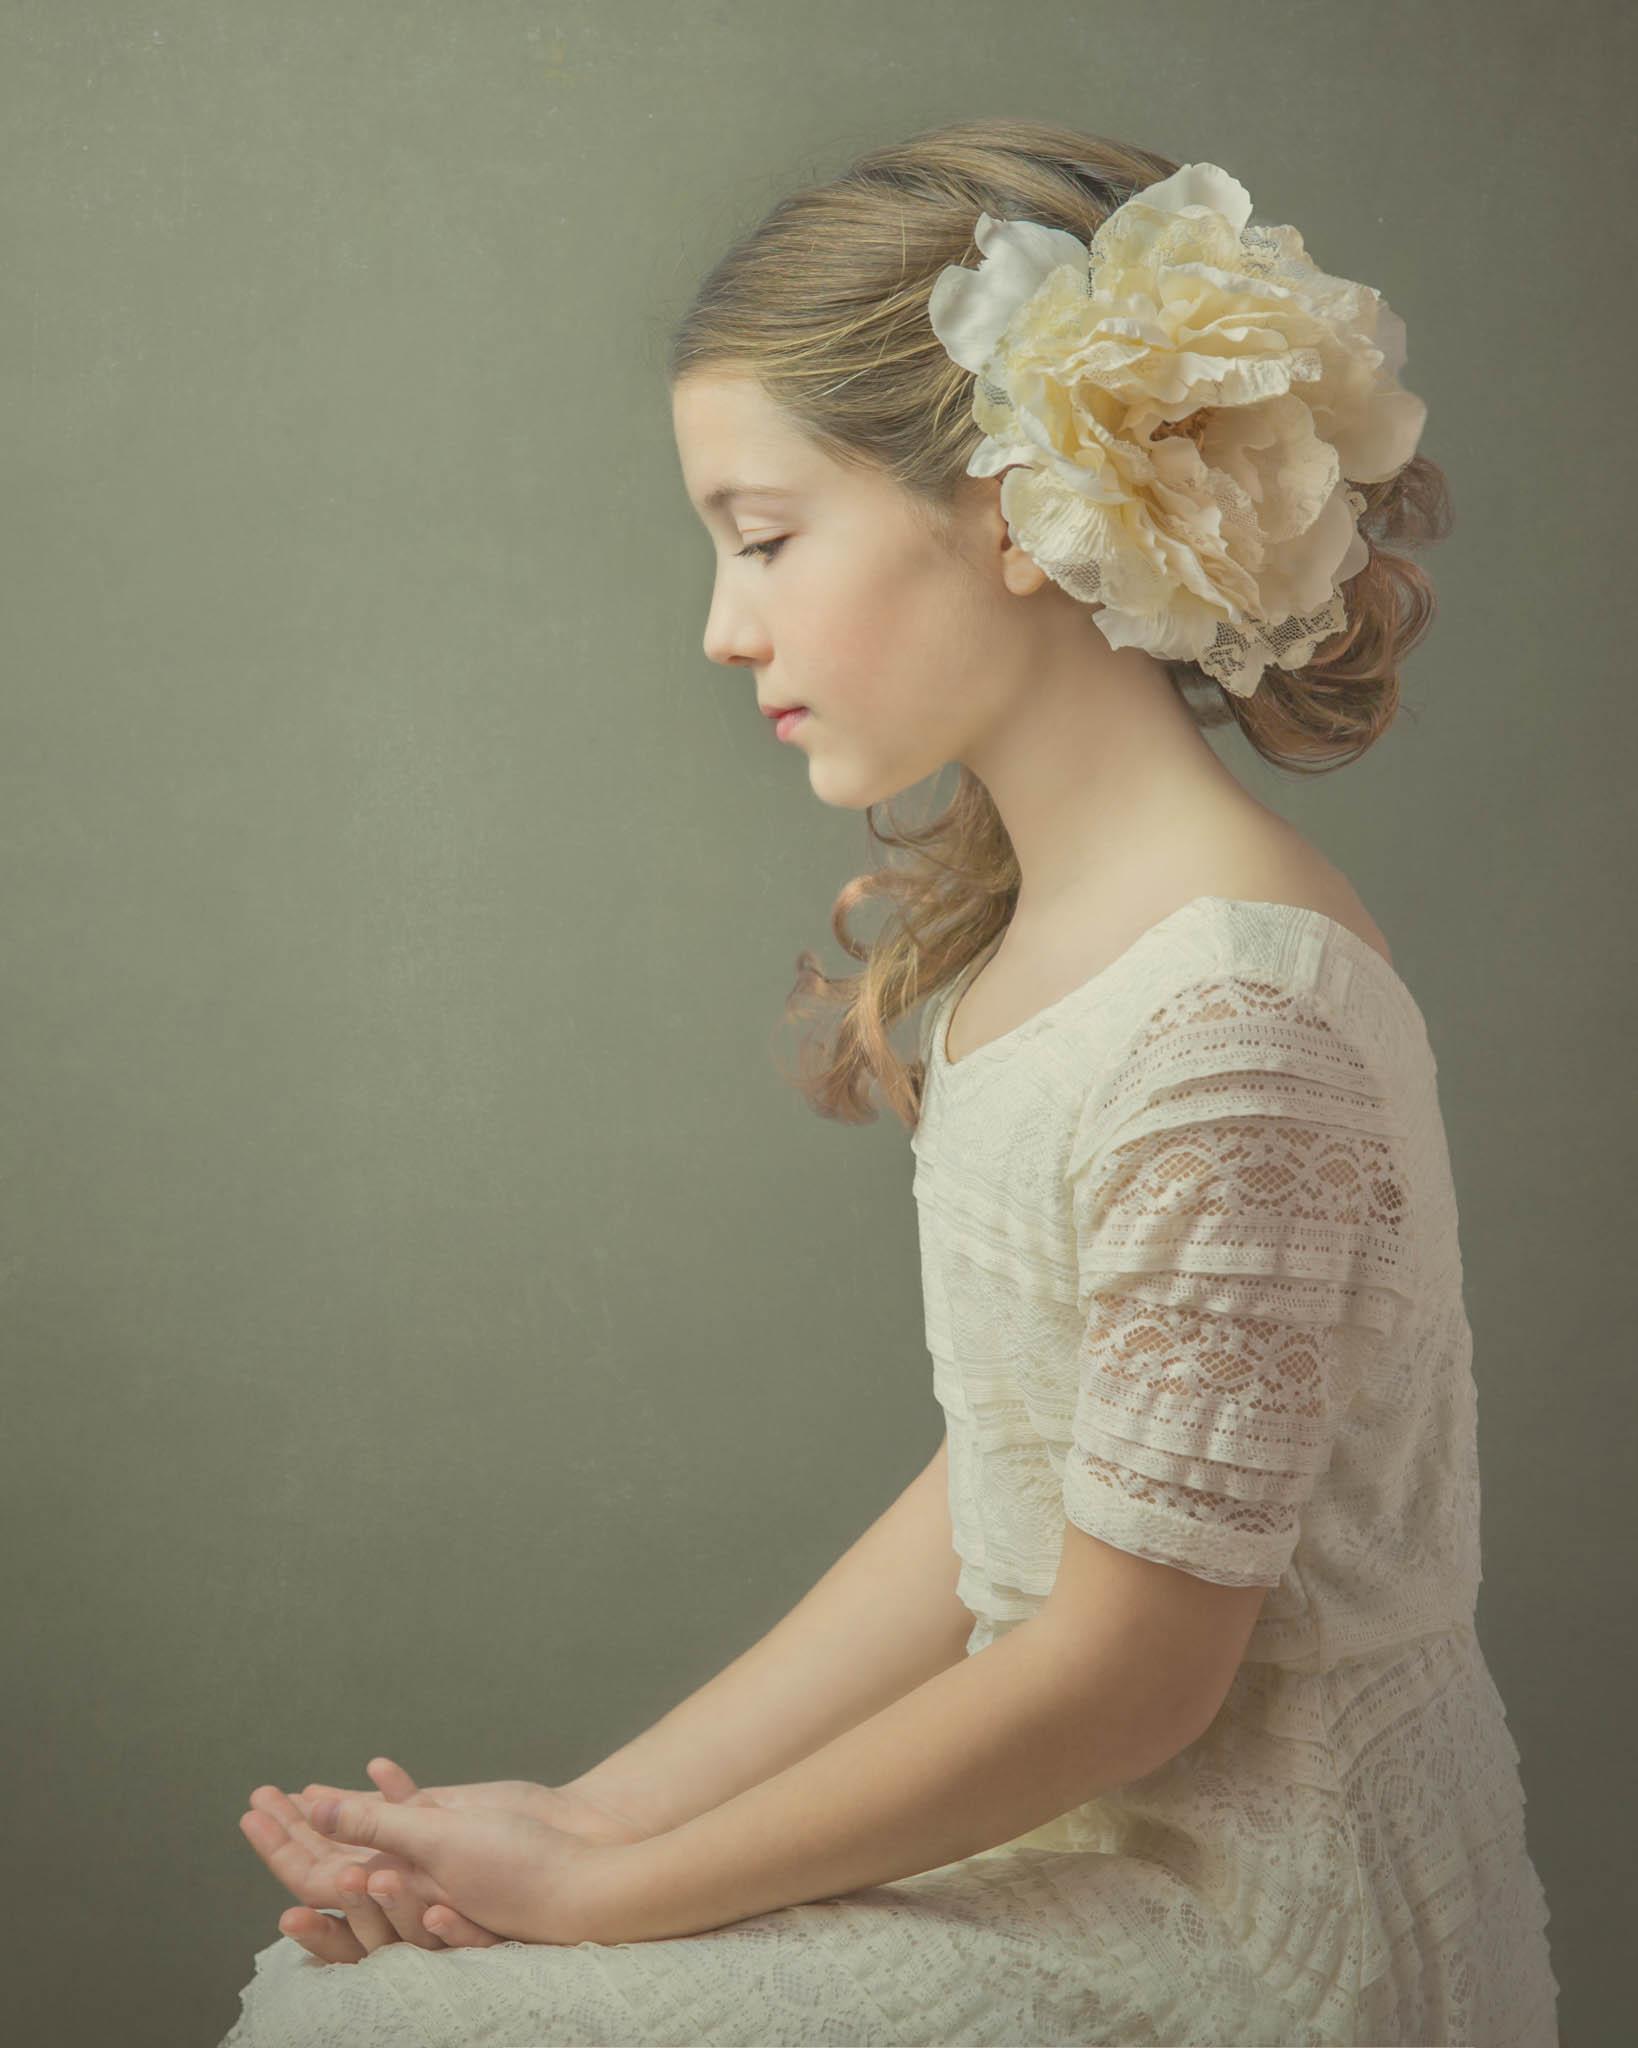 06-alana-lee-girl in lace dress_desert sand_regal.jpg